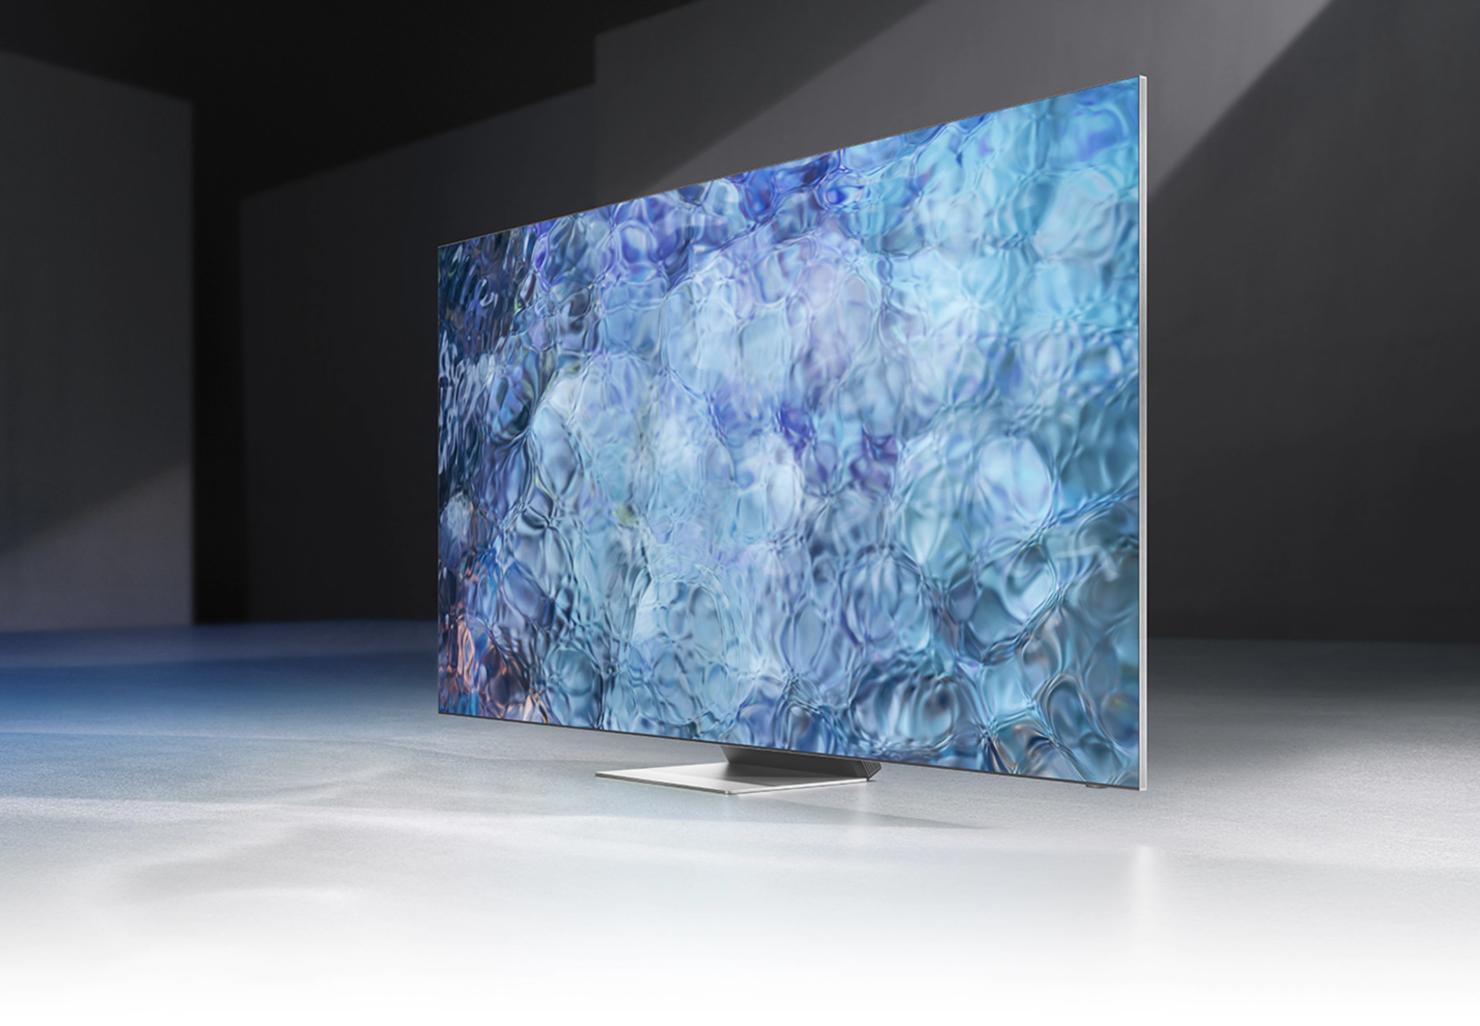 samsung 8k tv deal